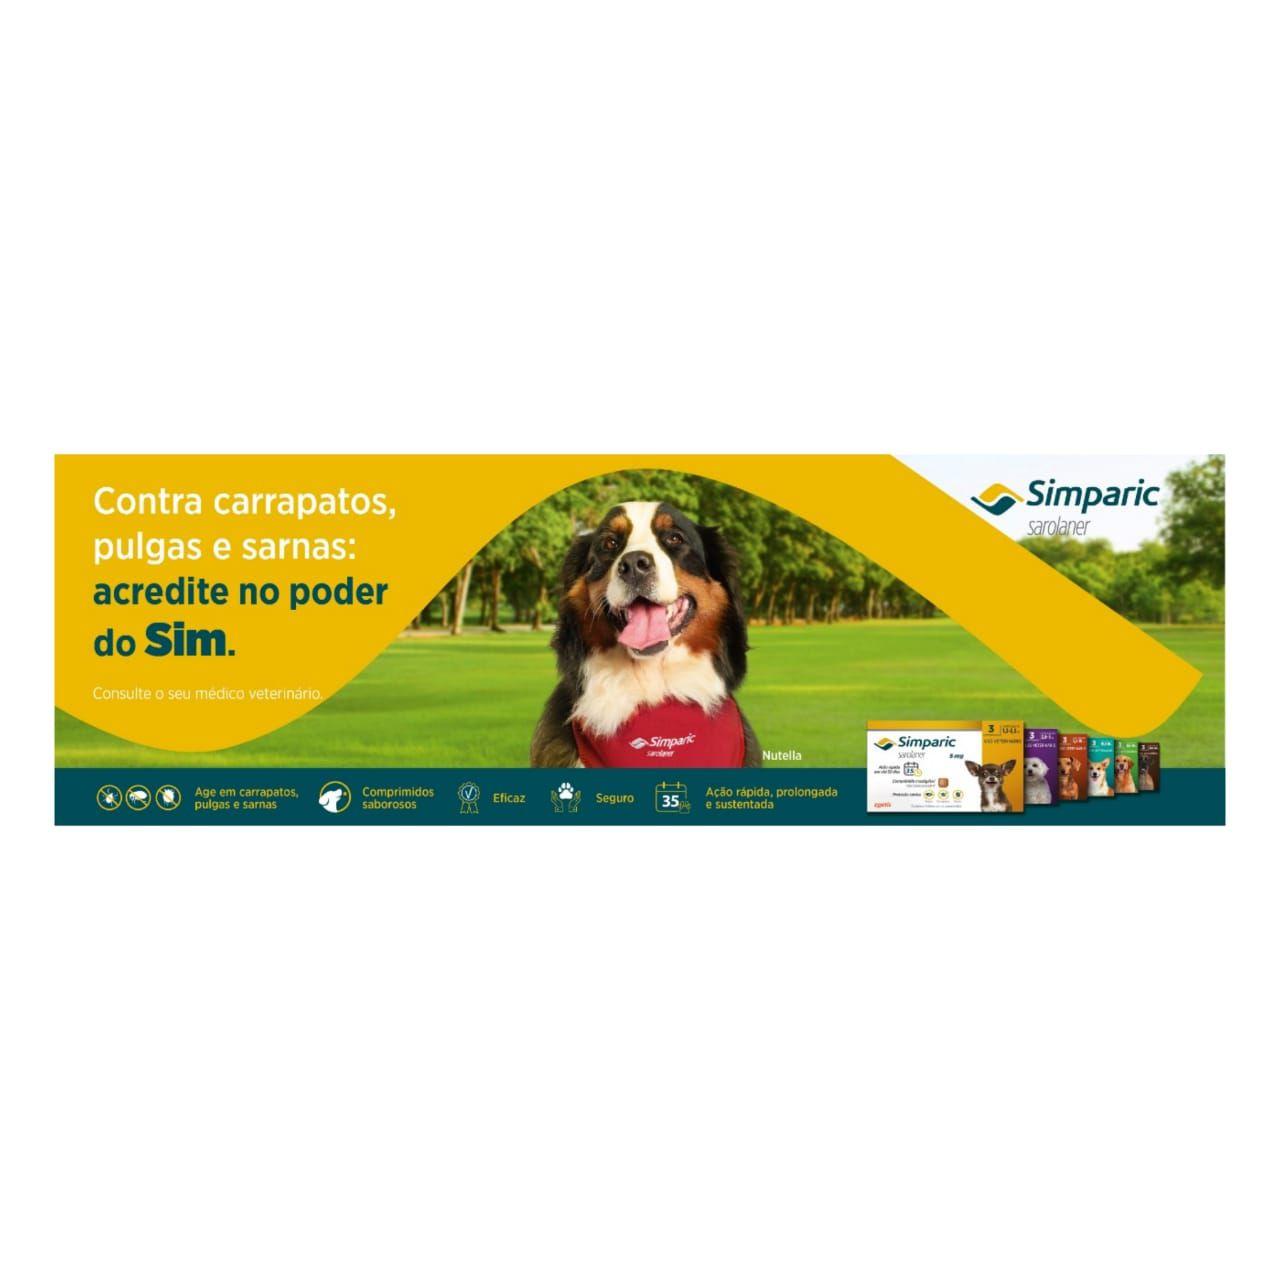 Antipulgas Zoetis Simparic 10mg para Cães 2,6 a 5Kg - 3 Comprimidos